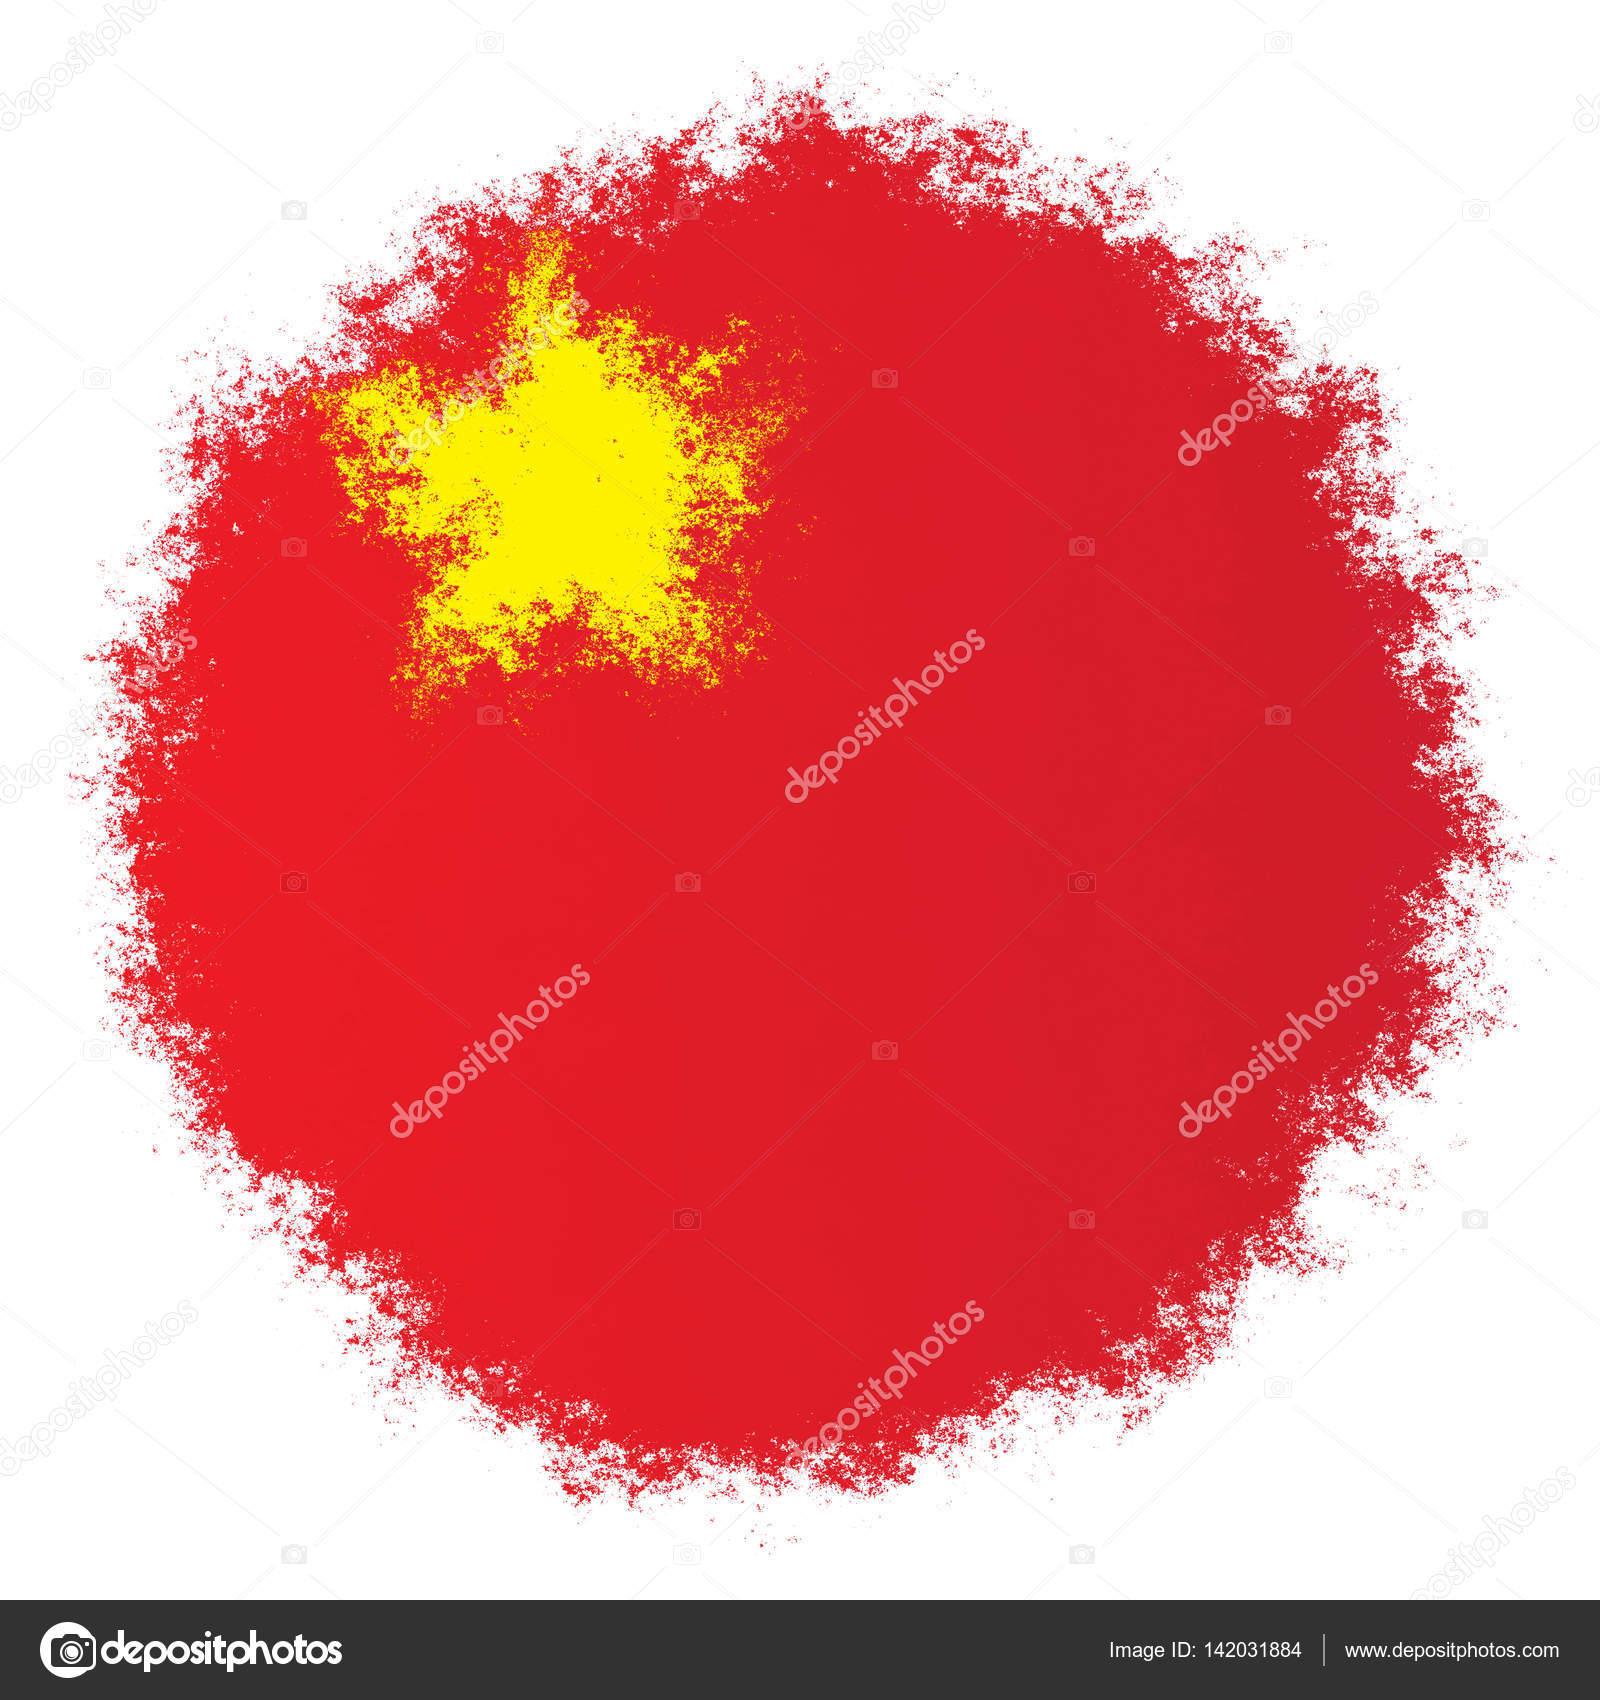 flagge china — Stockfoto © dragunov #142031884